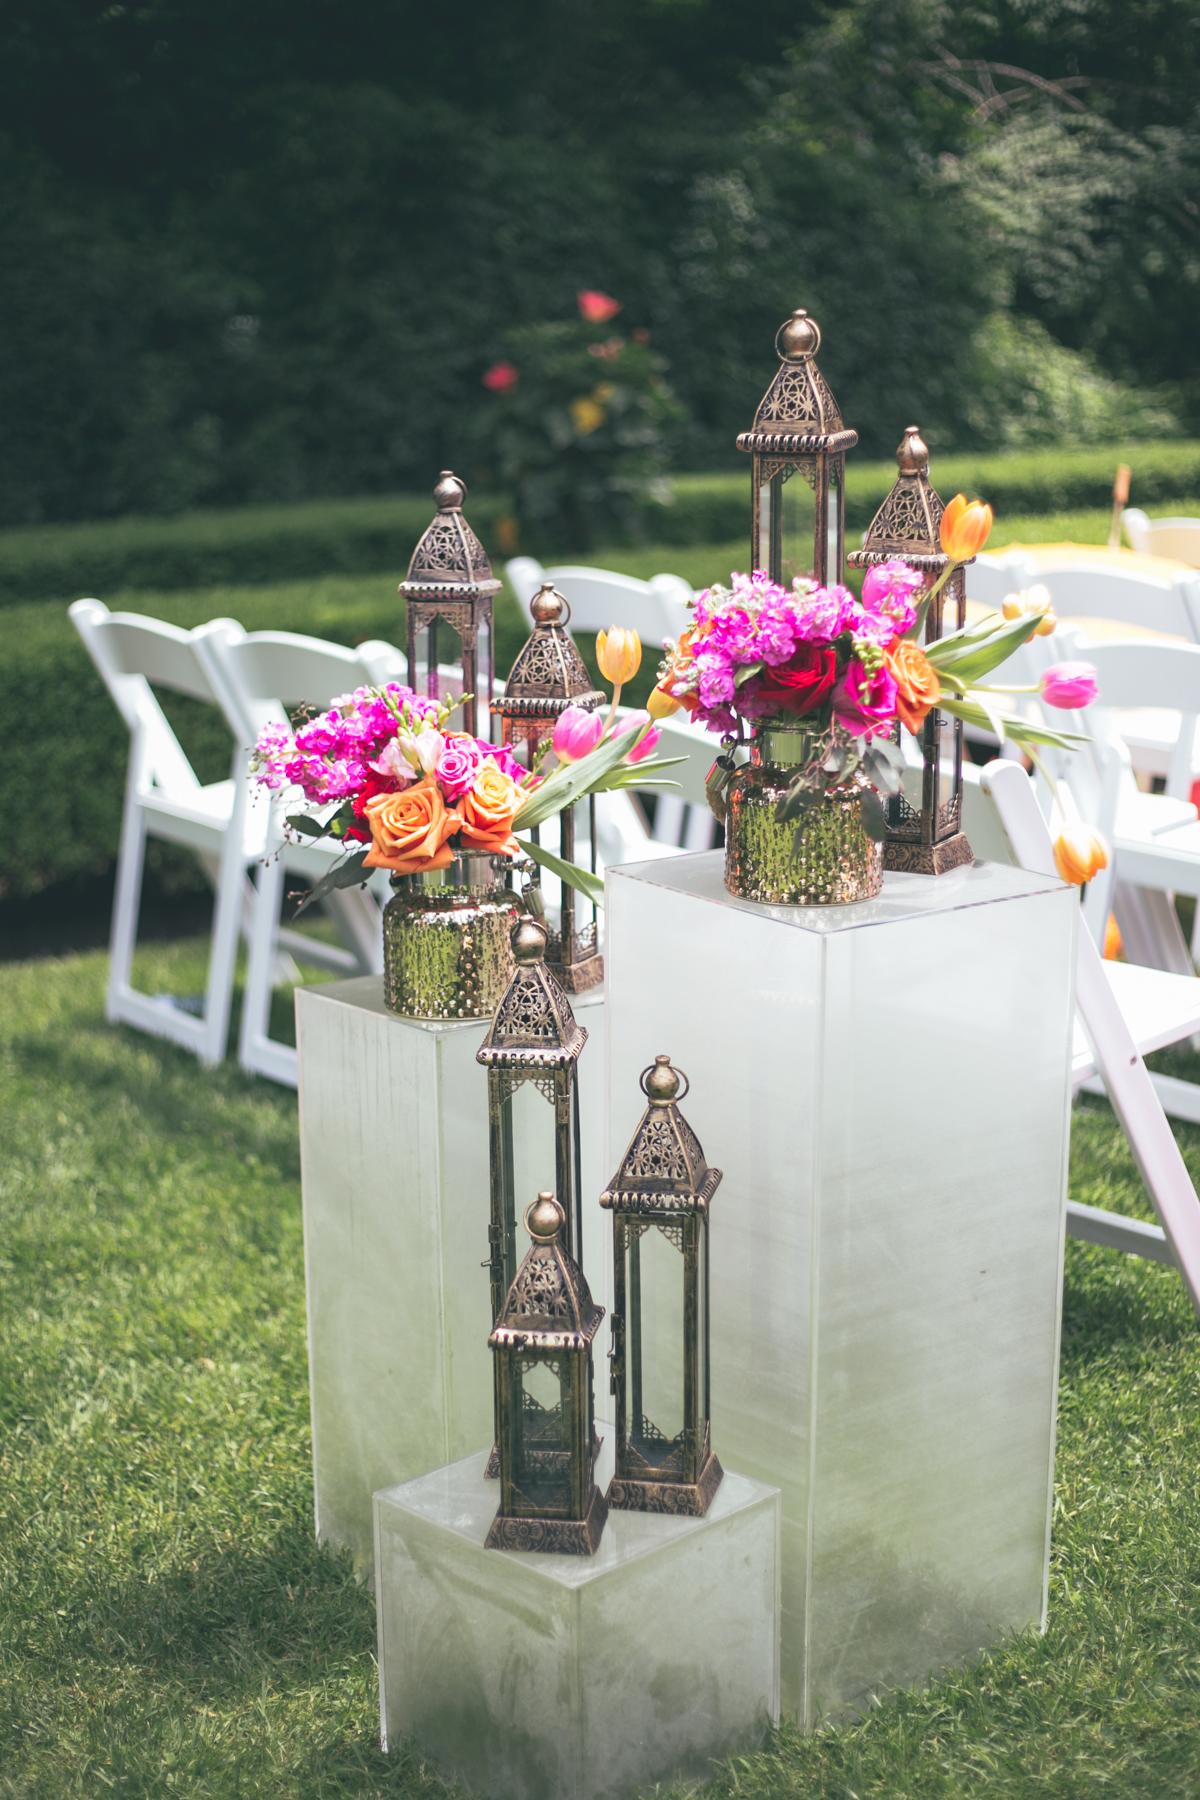 Indian Garden Wedding - The Love Studio005.jpg